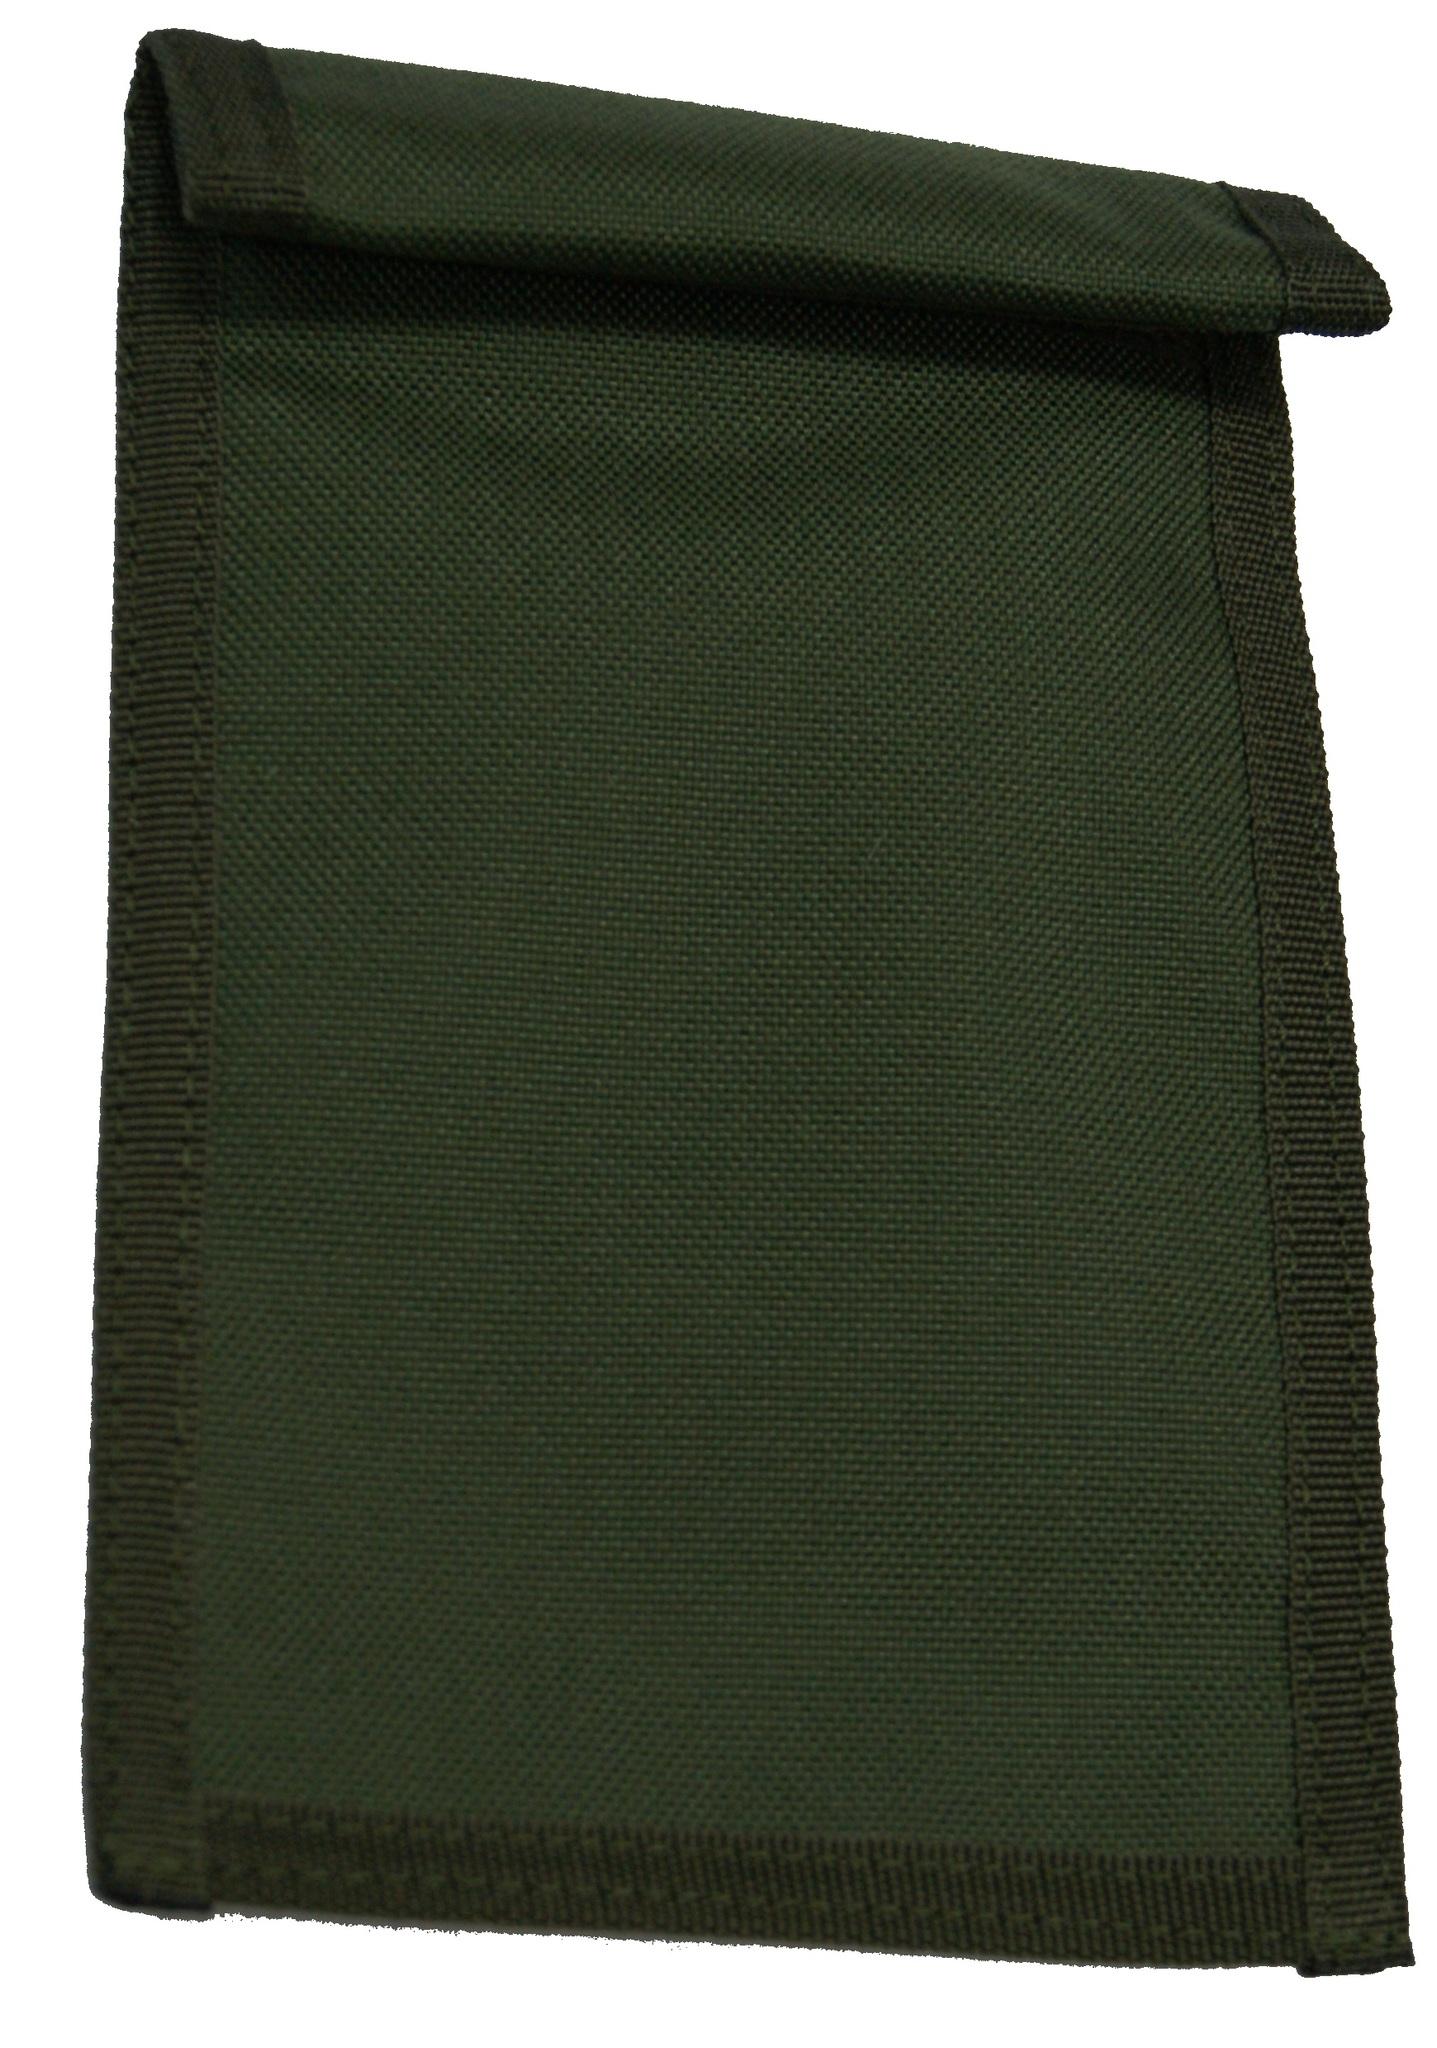 Чехол для телефона RadioBlock Case AVP, 10х25 см